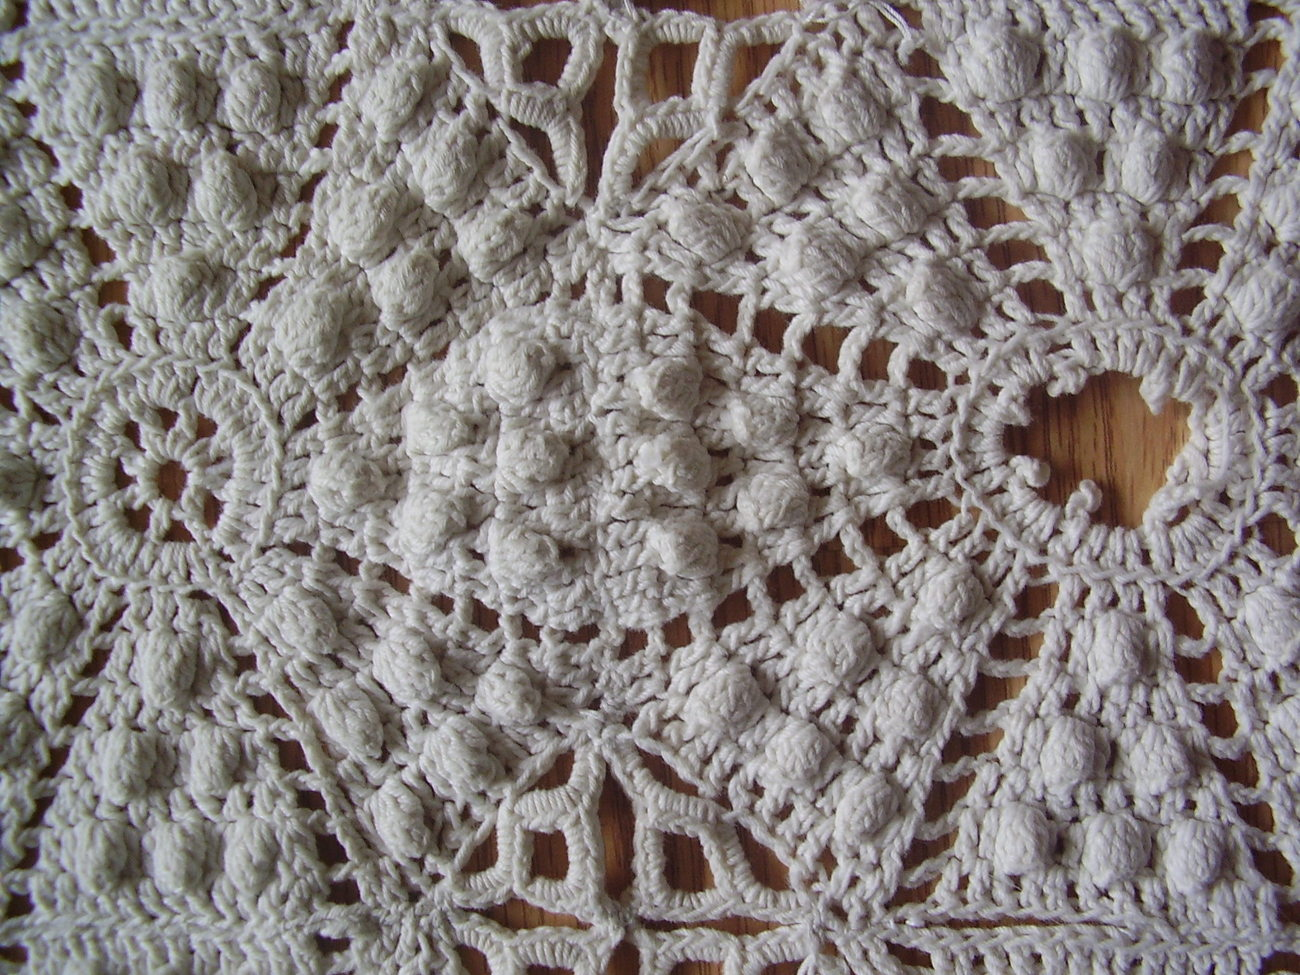 Vintage - Diamond / Popcorn Crochet Throw image 4